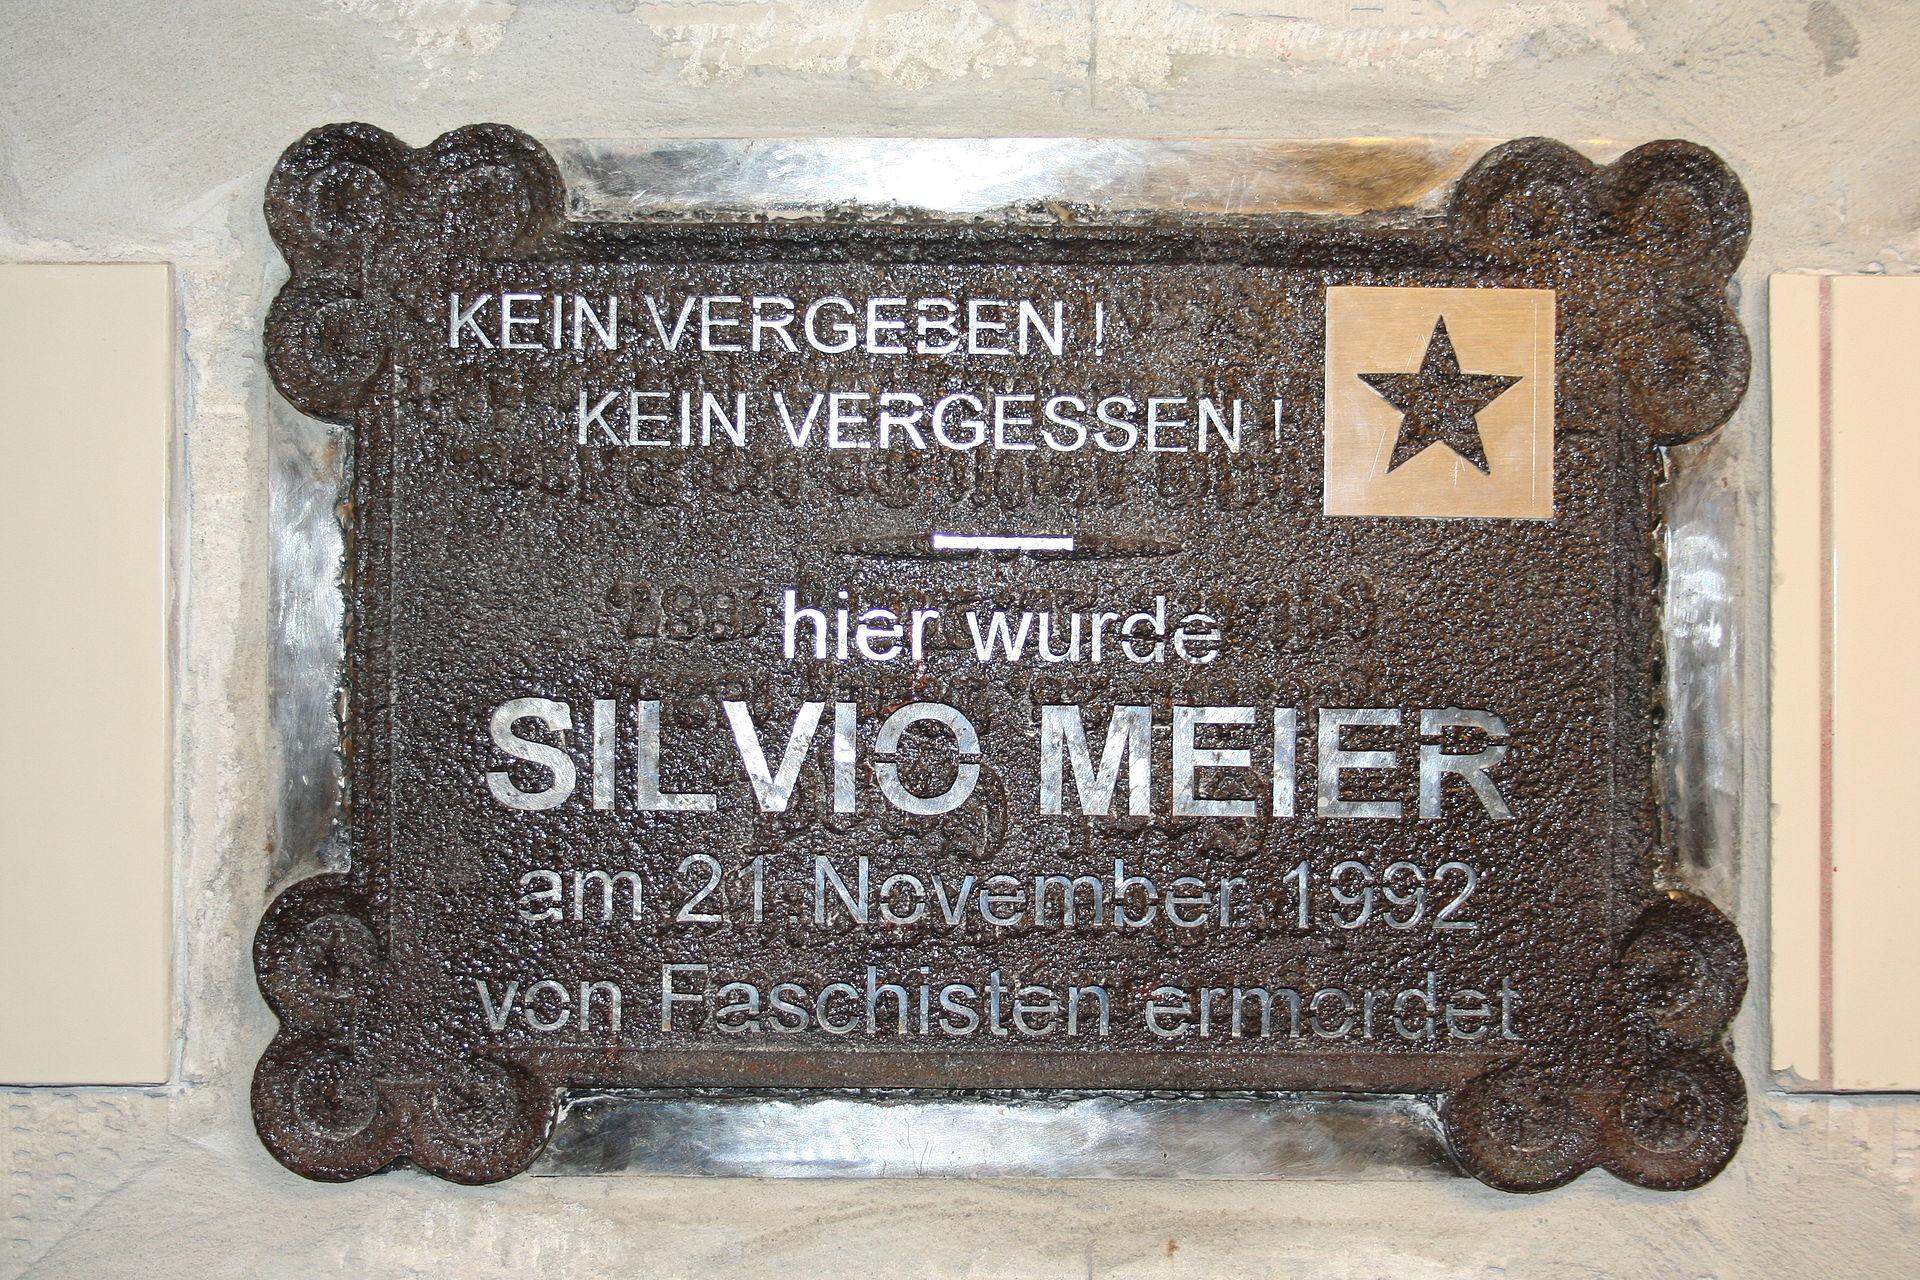 https://upload.wikimedia.org/wikipedia/commons/thumb/b/bb/U_Samariterstra%C3%9Fe_-_Silvio-Meier-Gedenktafel.jpg/1920px-U_Samariterstra%C3%9Fe_-_Silvio-Meier-Gedenktafel.jpg